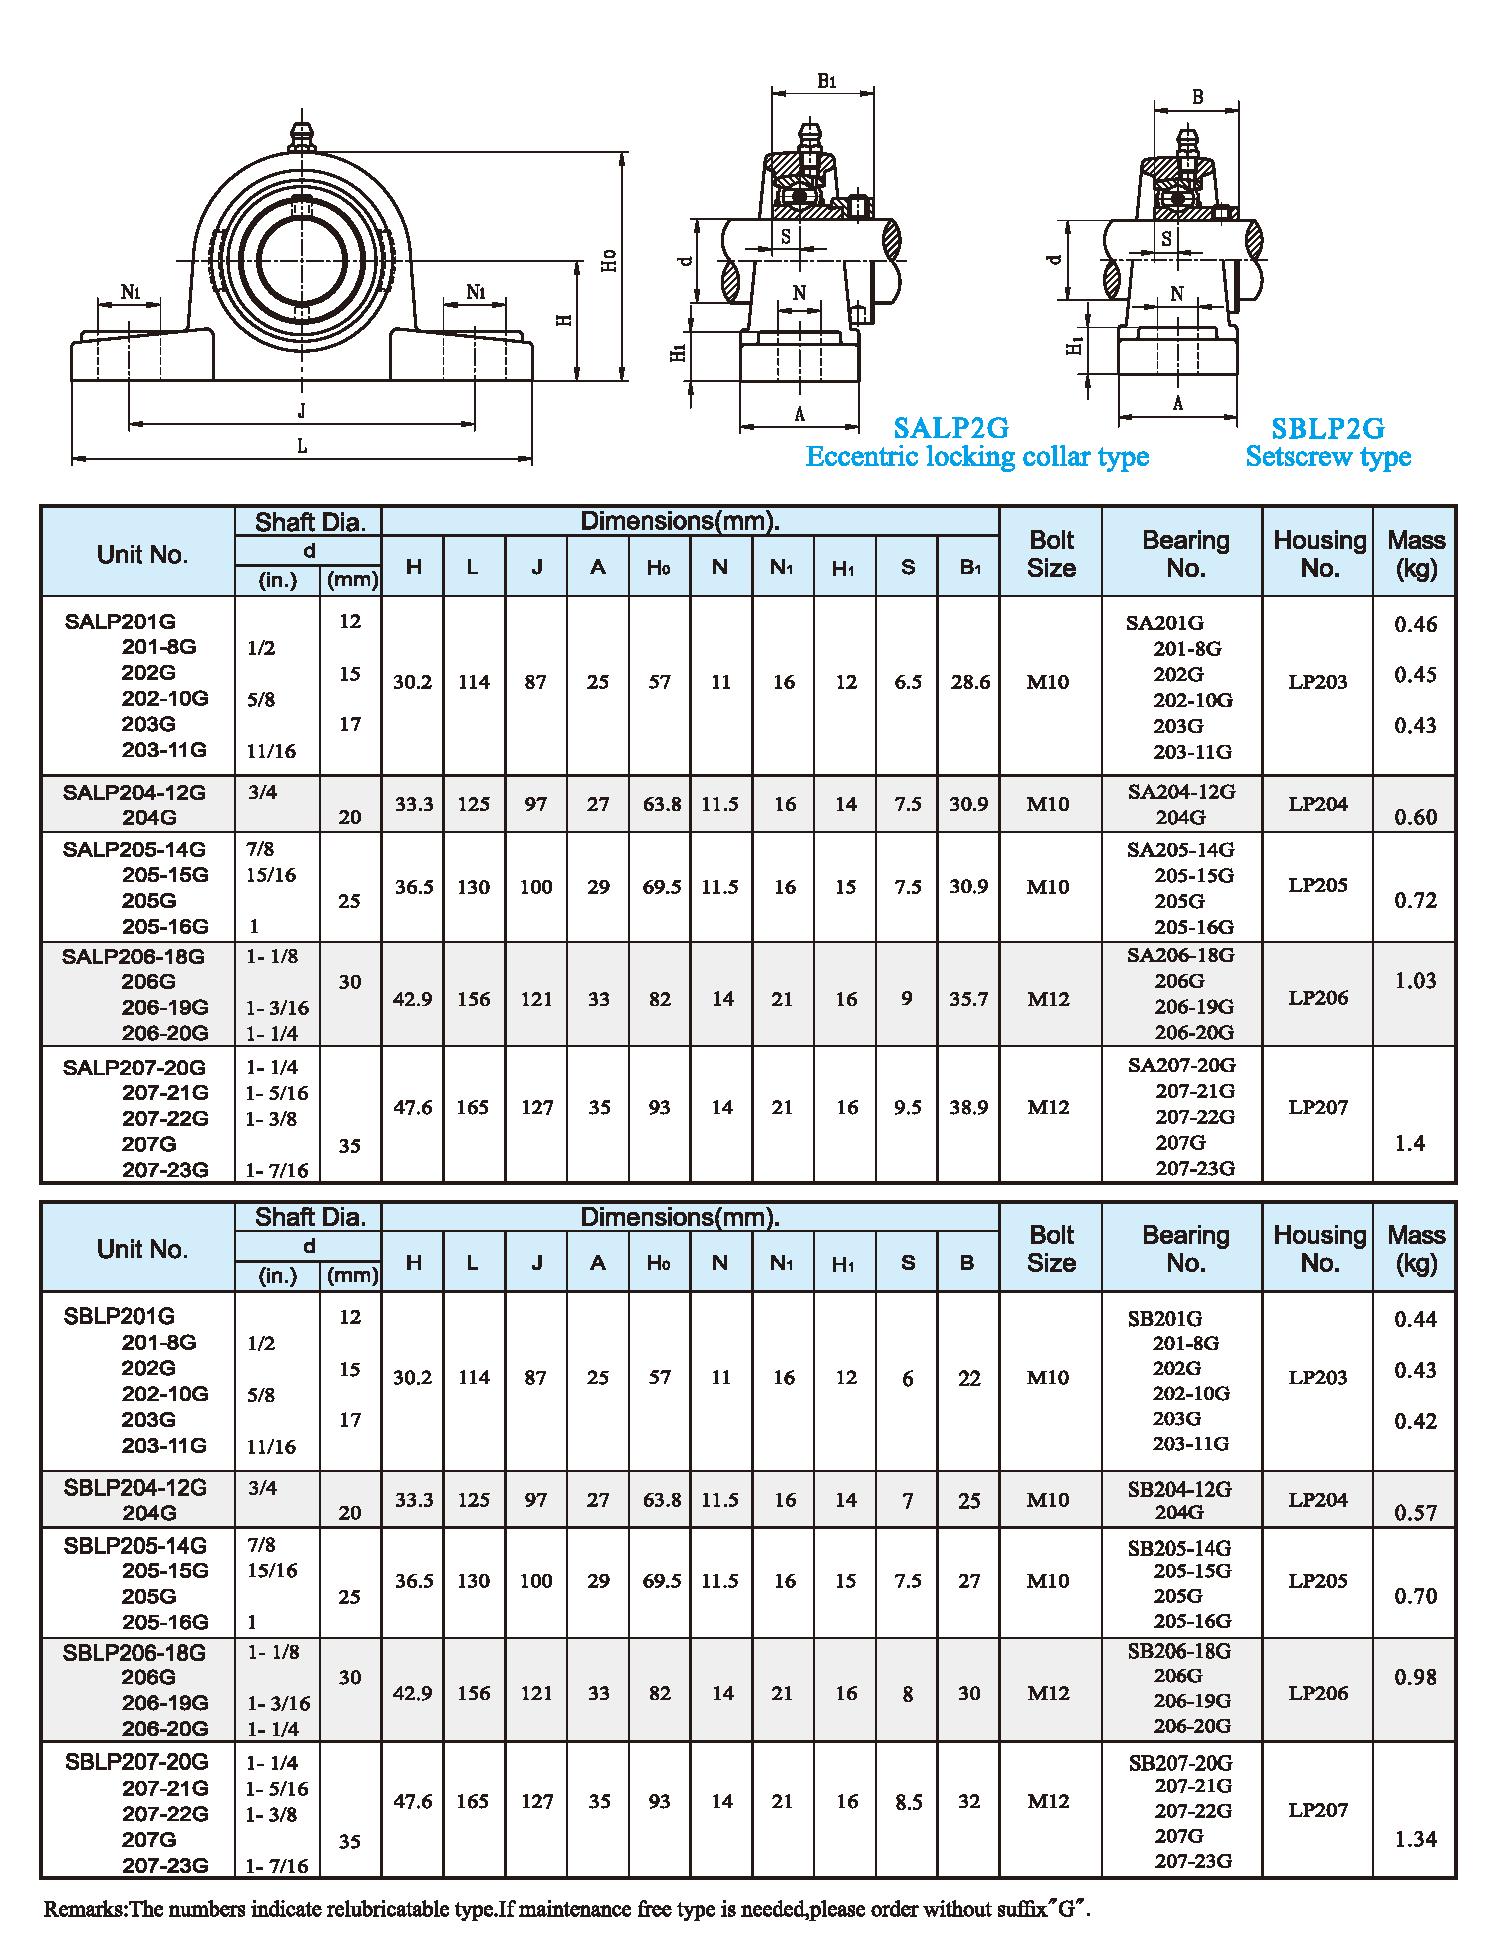 SALP2G,SBLP2G Setscrew type